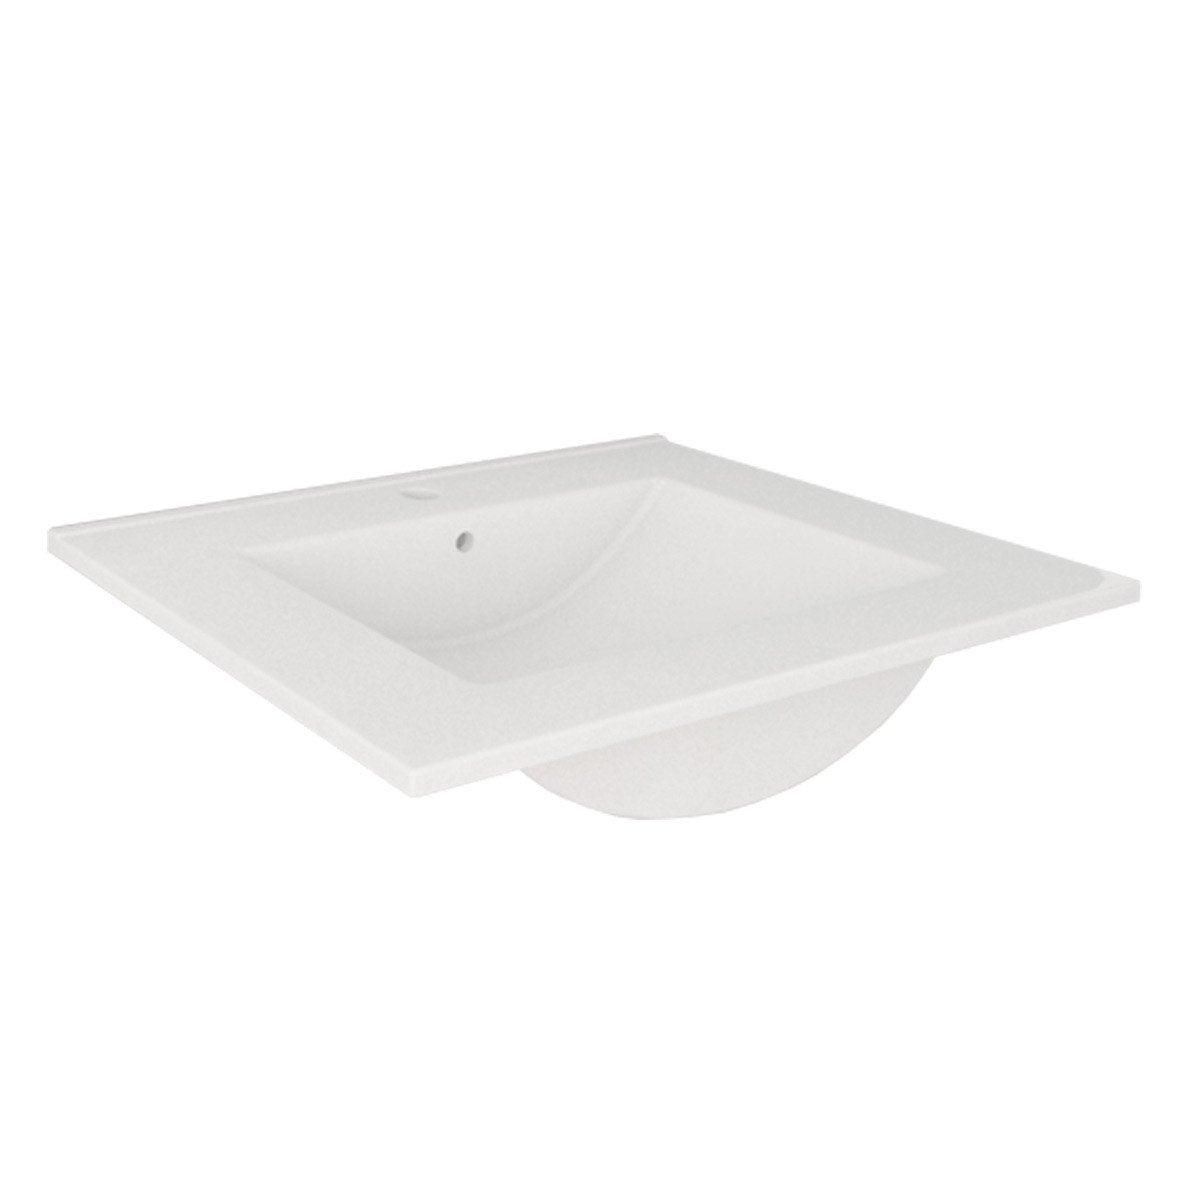 plan vasque simple carla 70 cm leroy merlin. Black Bedroom Furniture Sets. Home Design Ideas